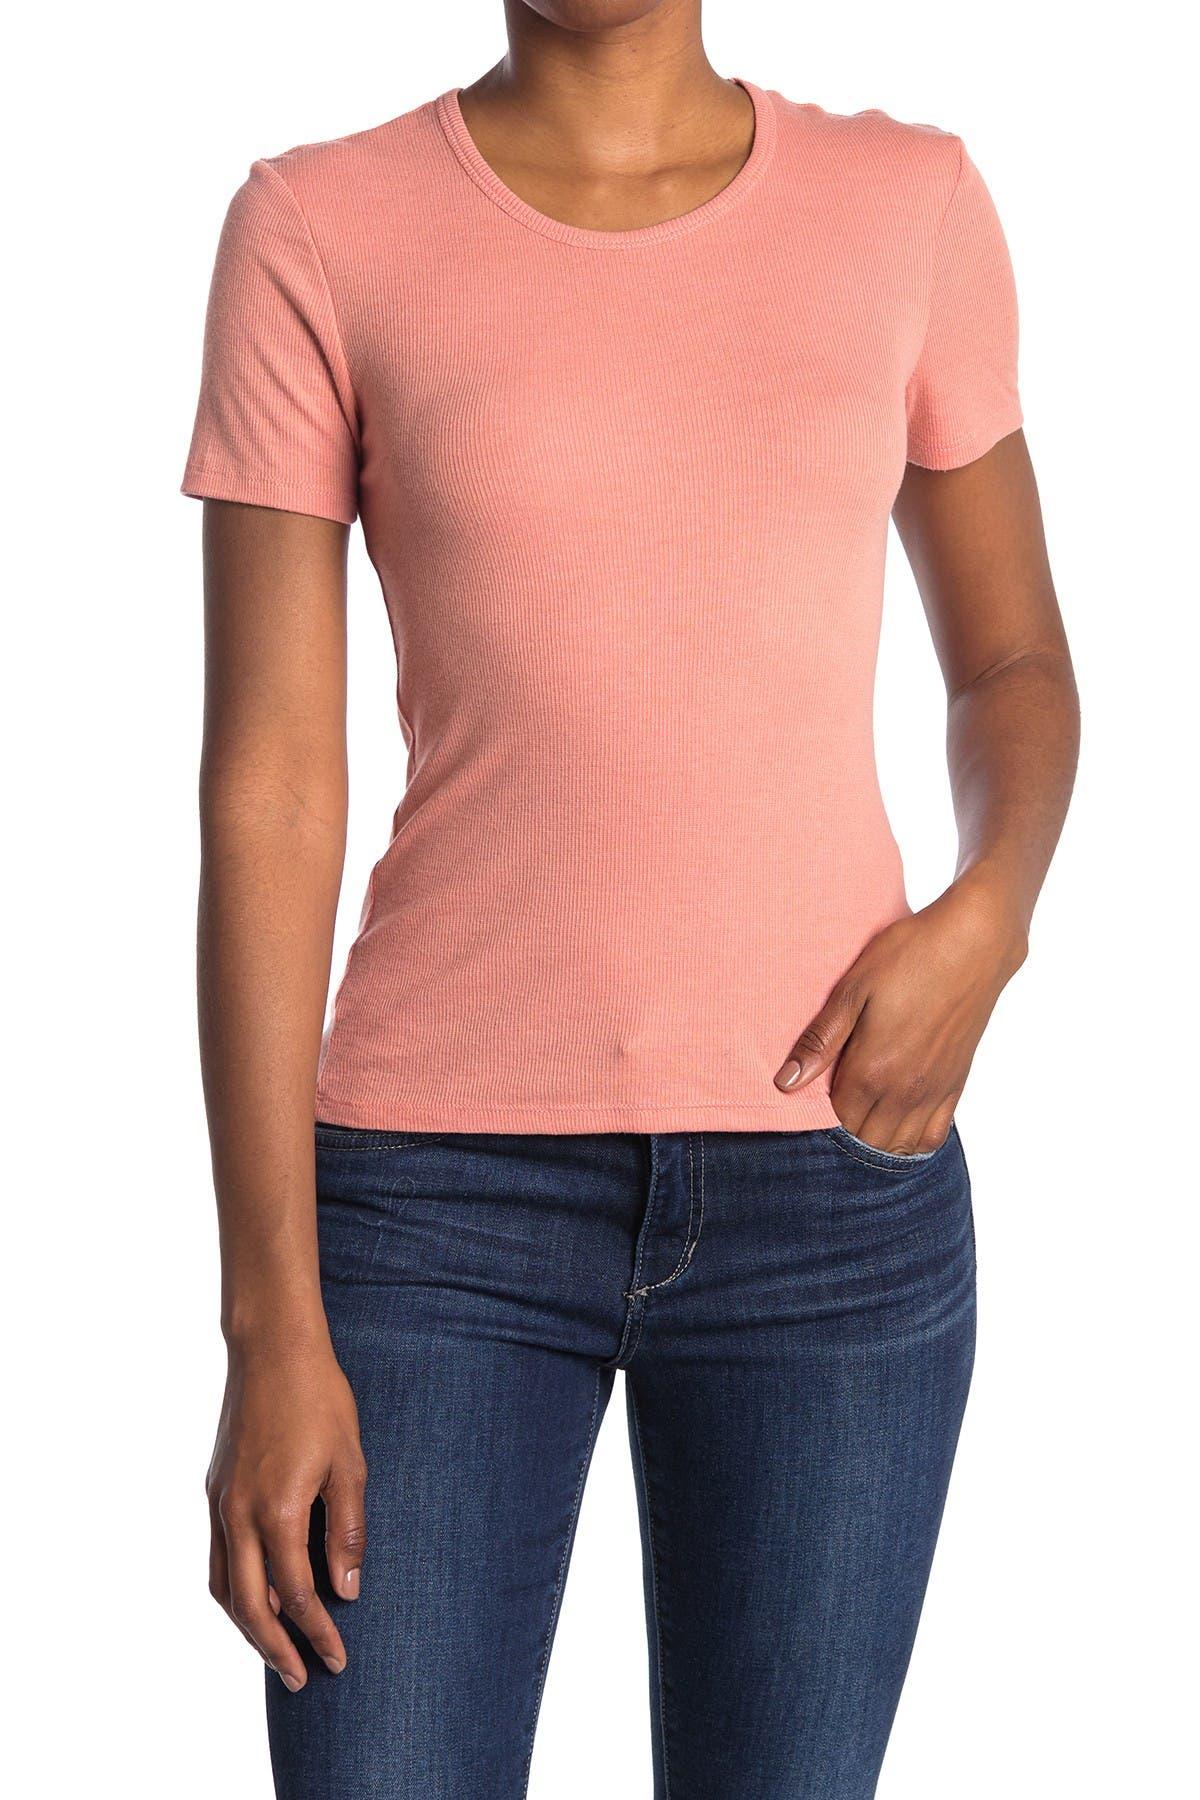 Image of Alternative The Mia Rib Knit Lounge T-Shirt